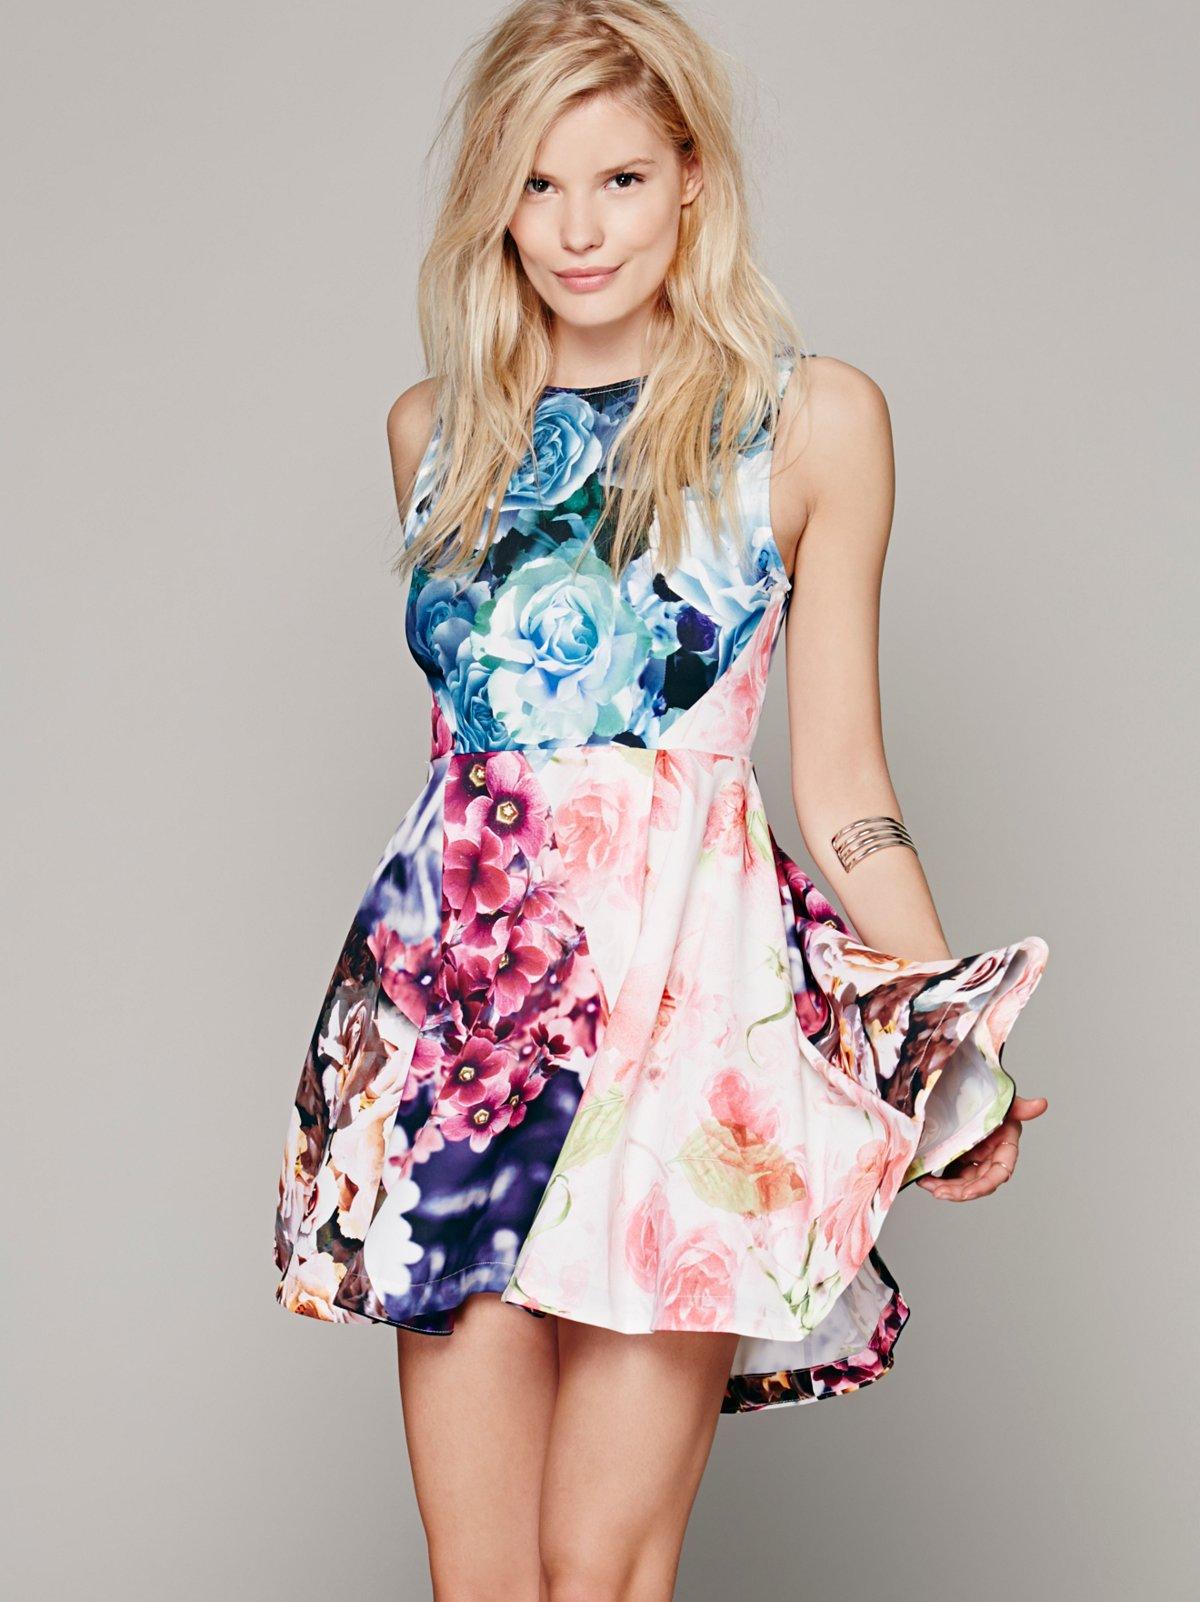 Flower Bomb Kickout Dress